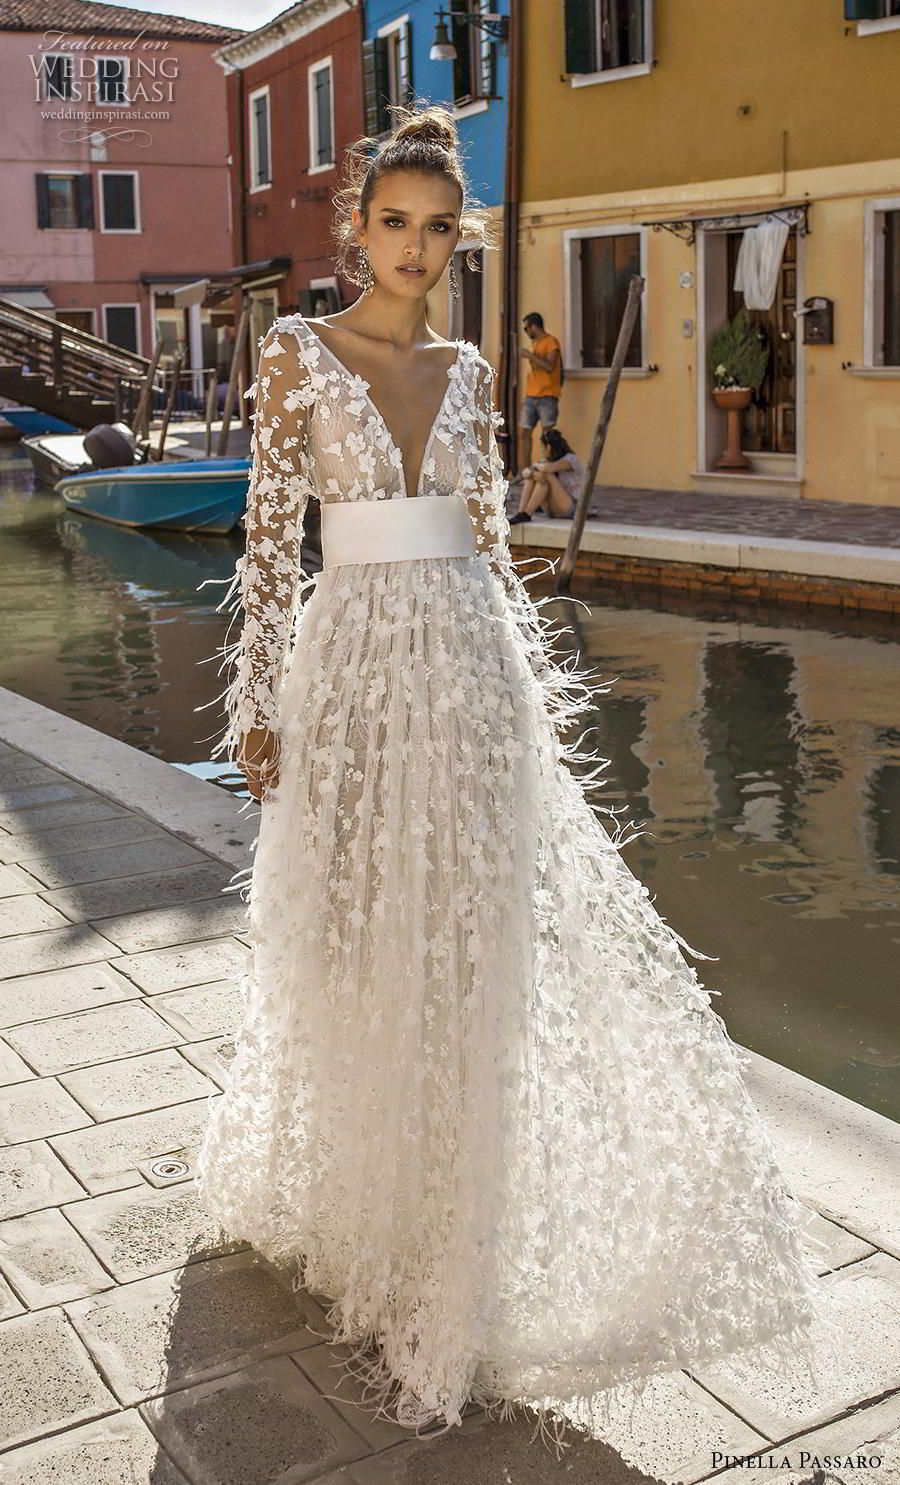 Pinella Passaro 2019 Wedding Dresses Wedding In Venice Bridal Collection Wedding Inspirasi Wedding Dress With Feathers Stunning Wedding Dresses Wedding Dresses [ 1485 x 900 Pixel ]